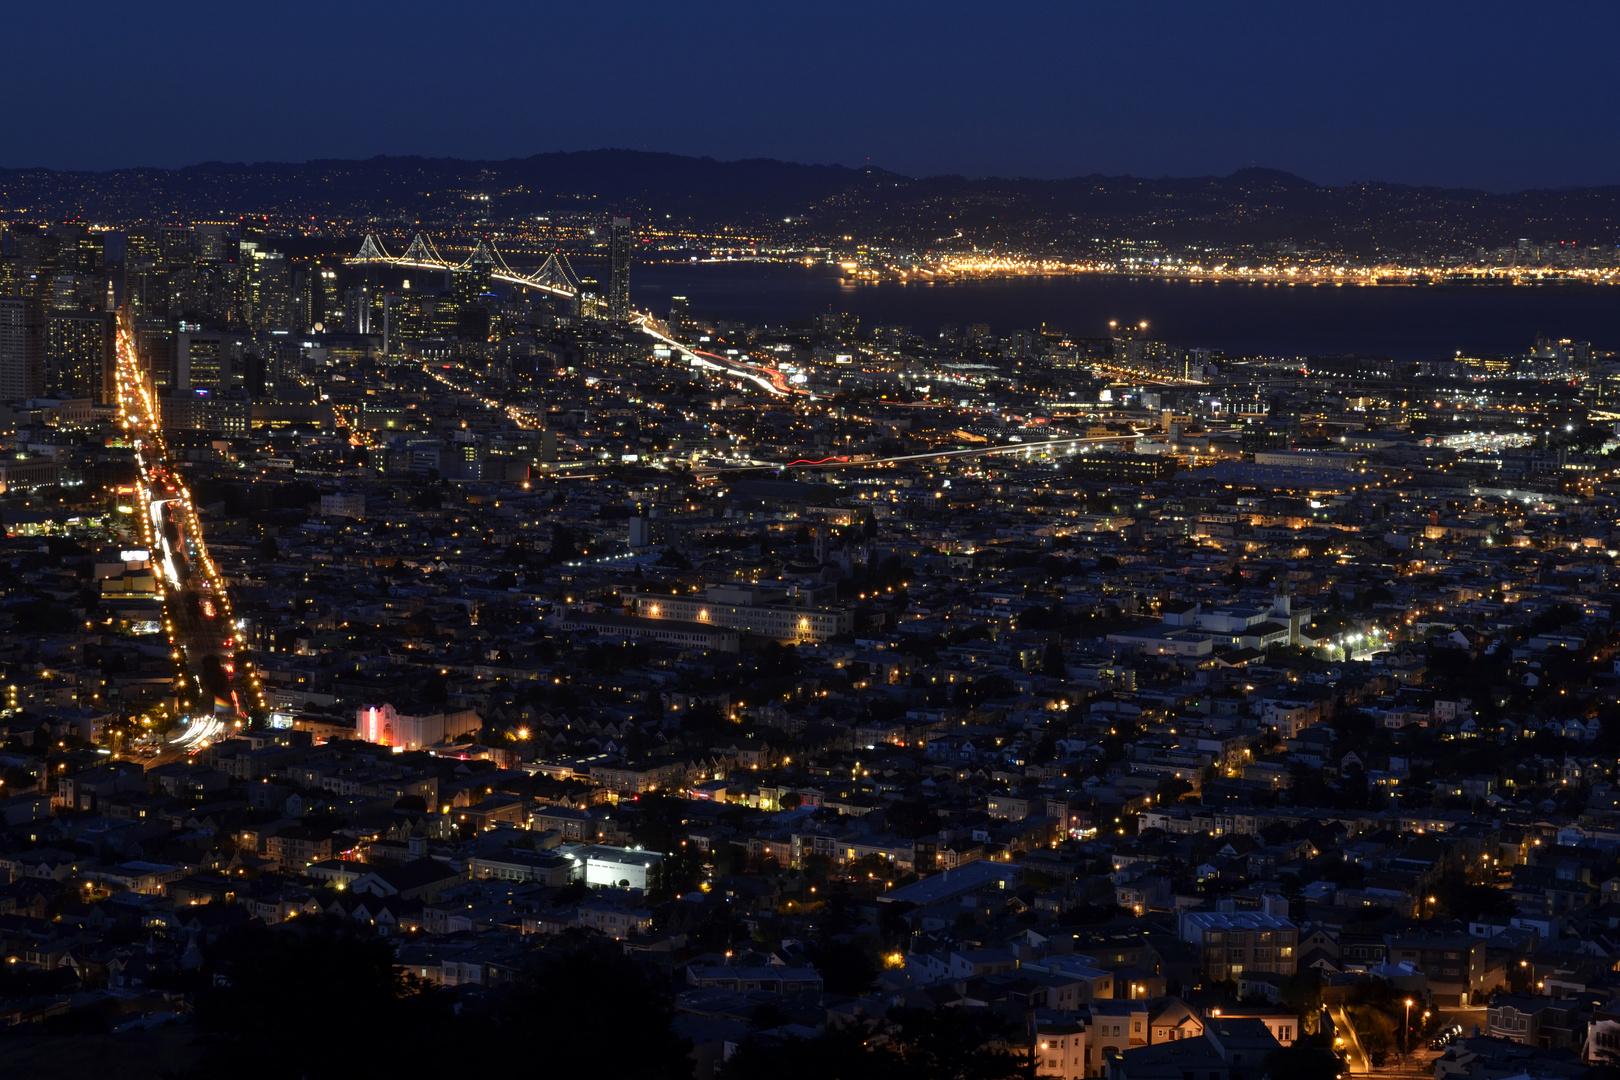 One night in San Francisco 2